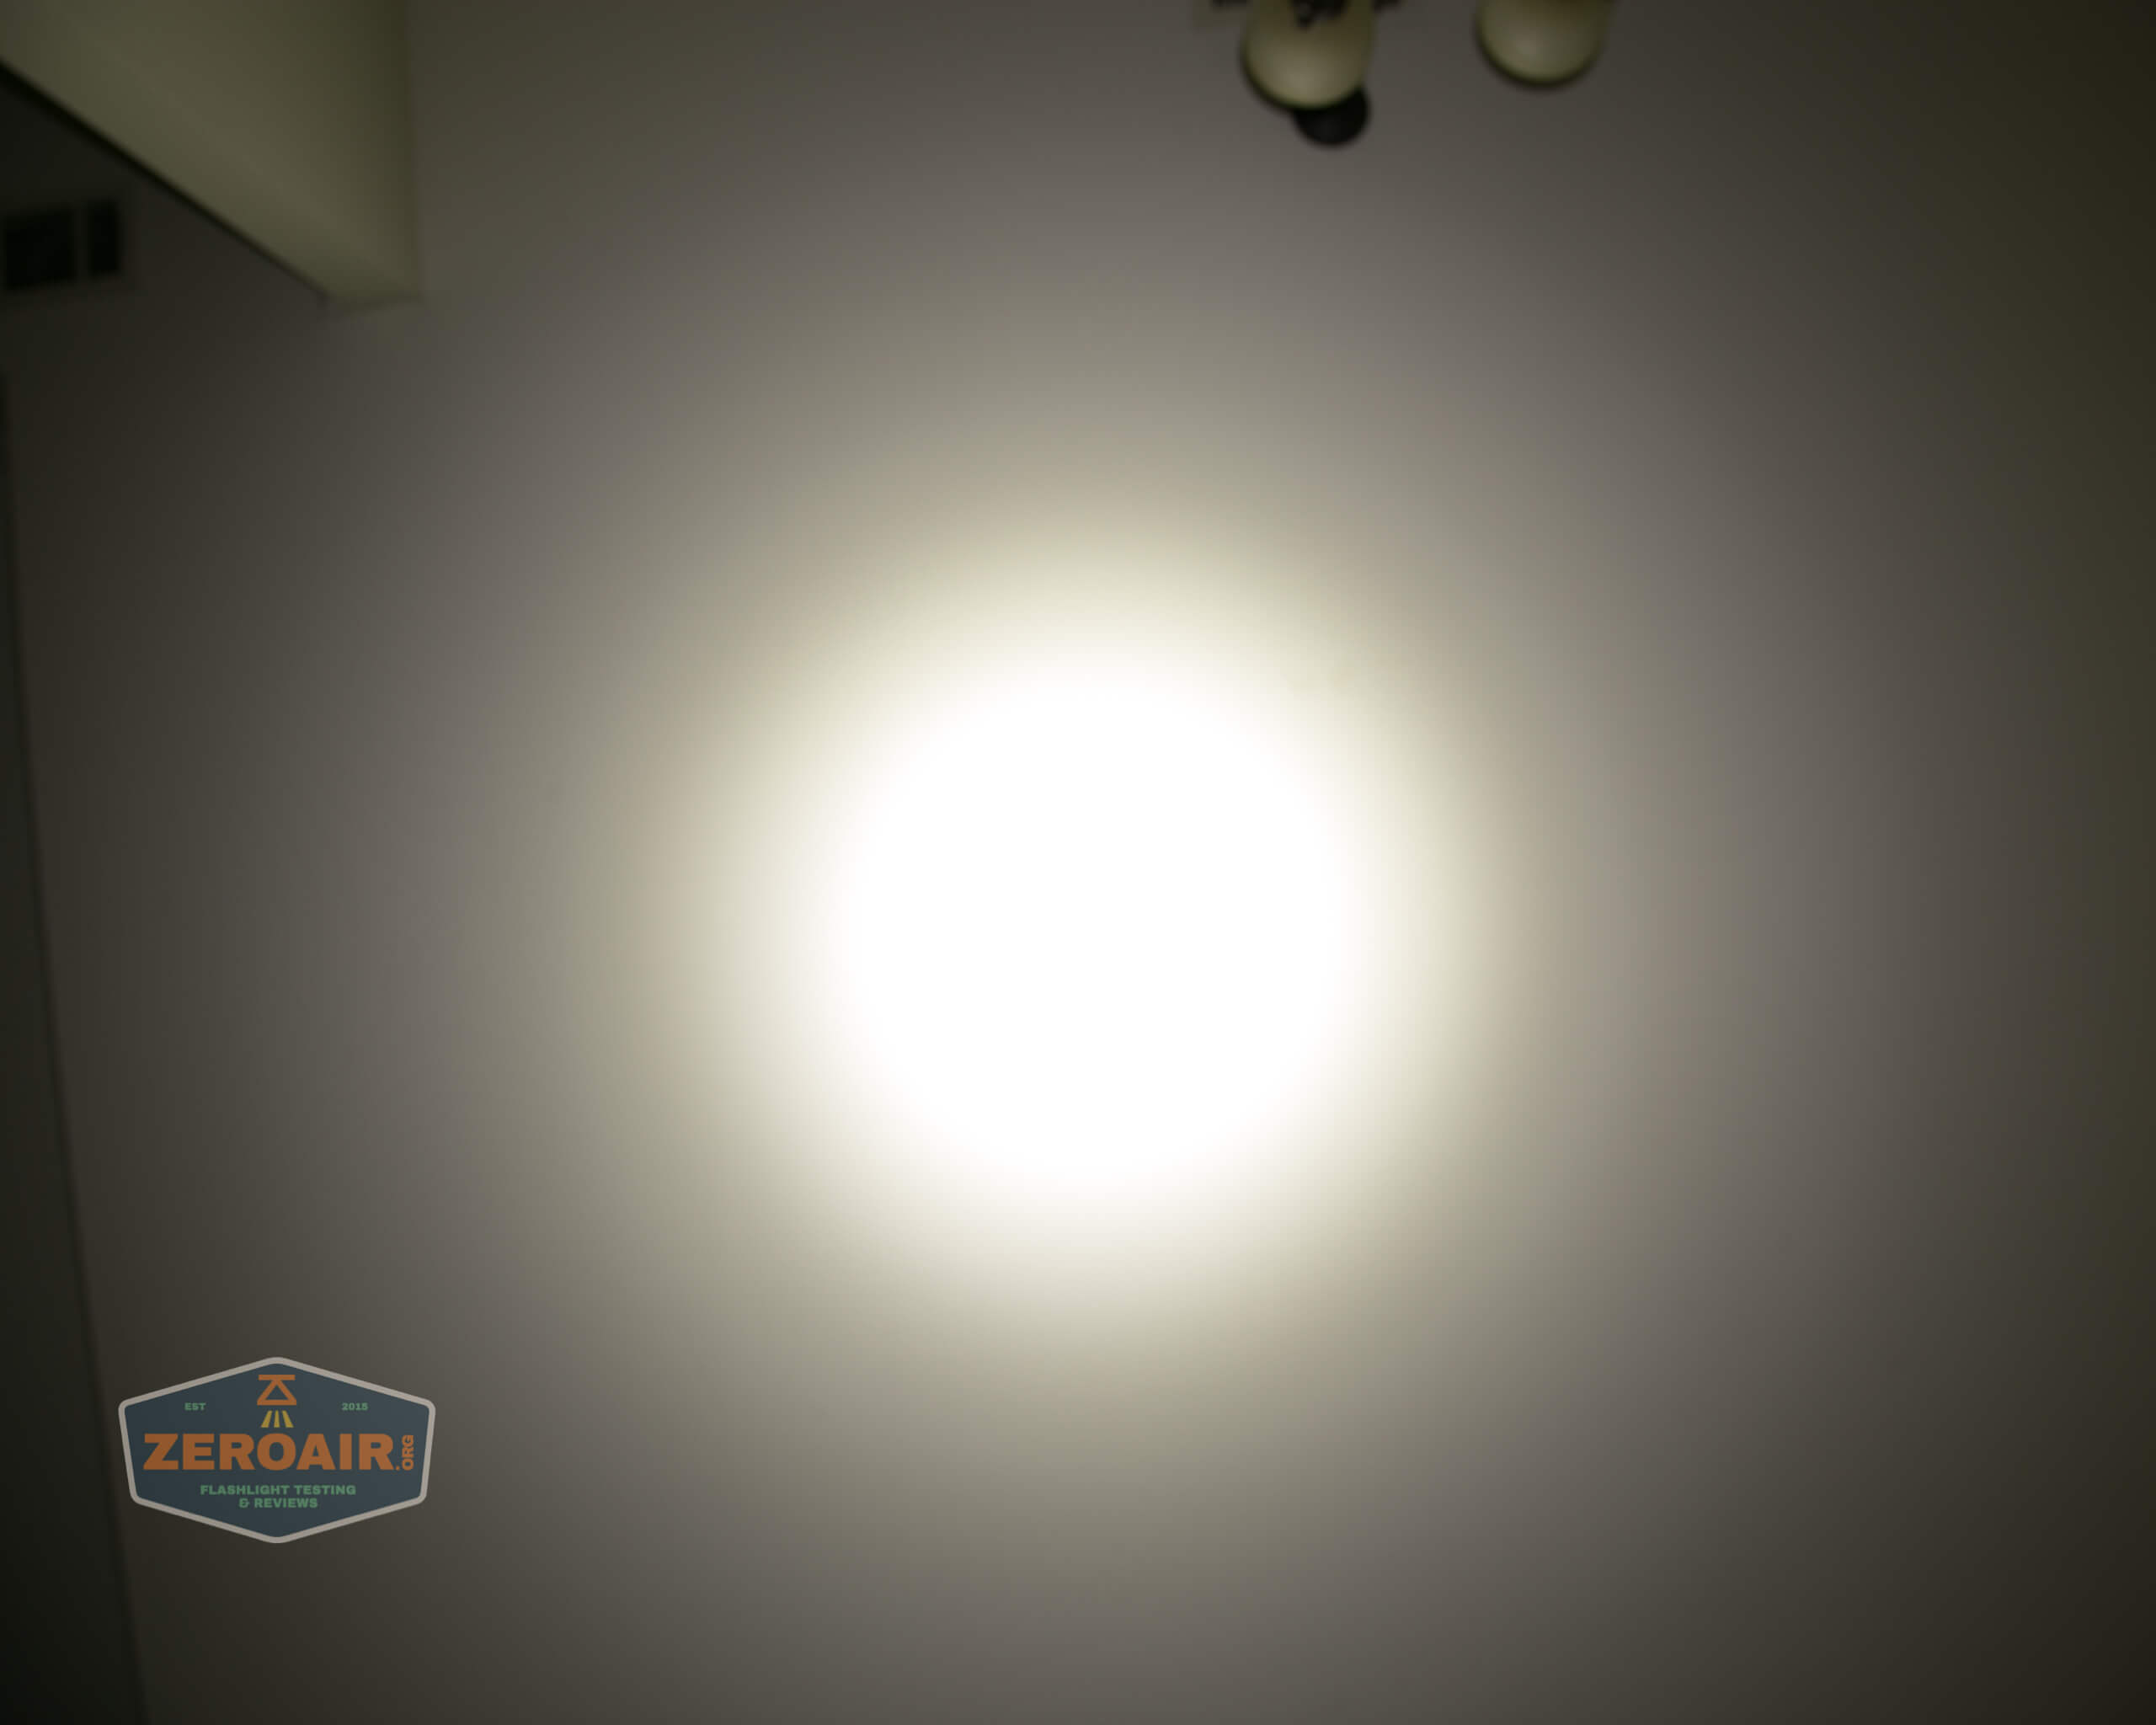 Olight m2r pro warrior beamshot ceiling 6